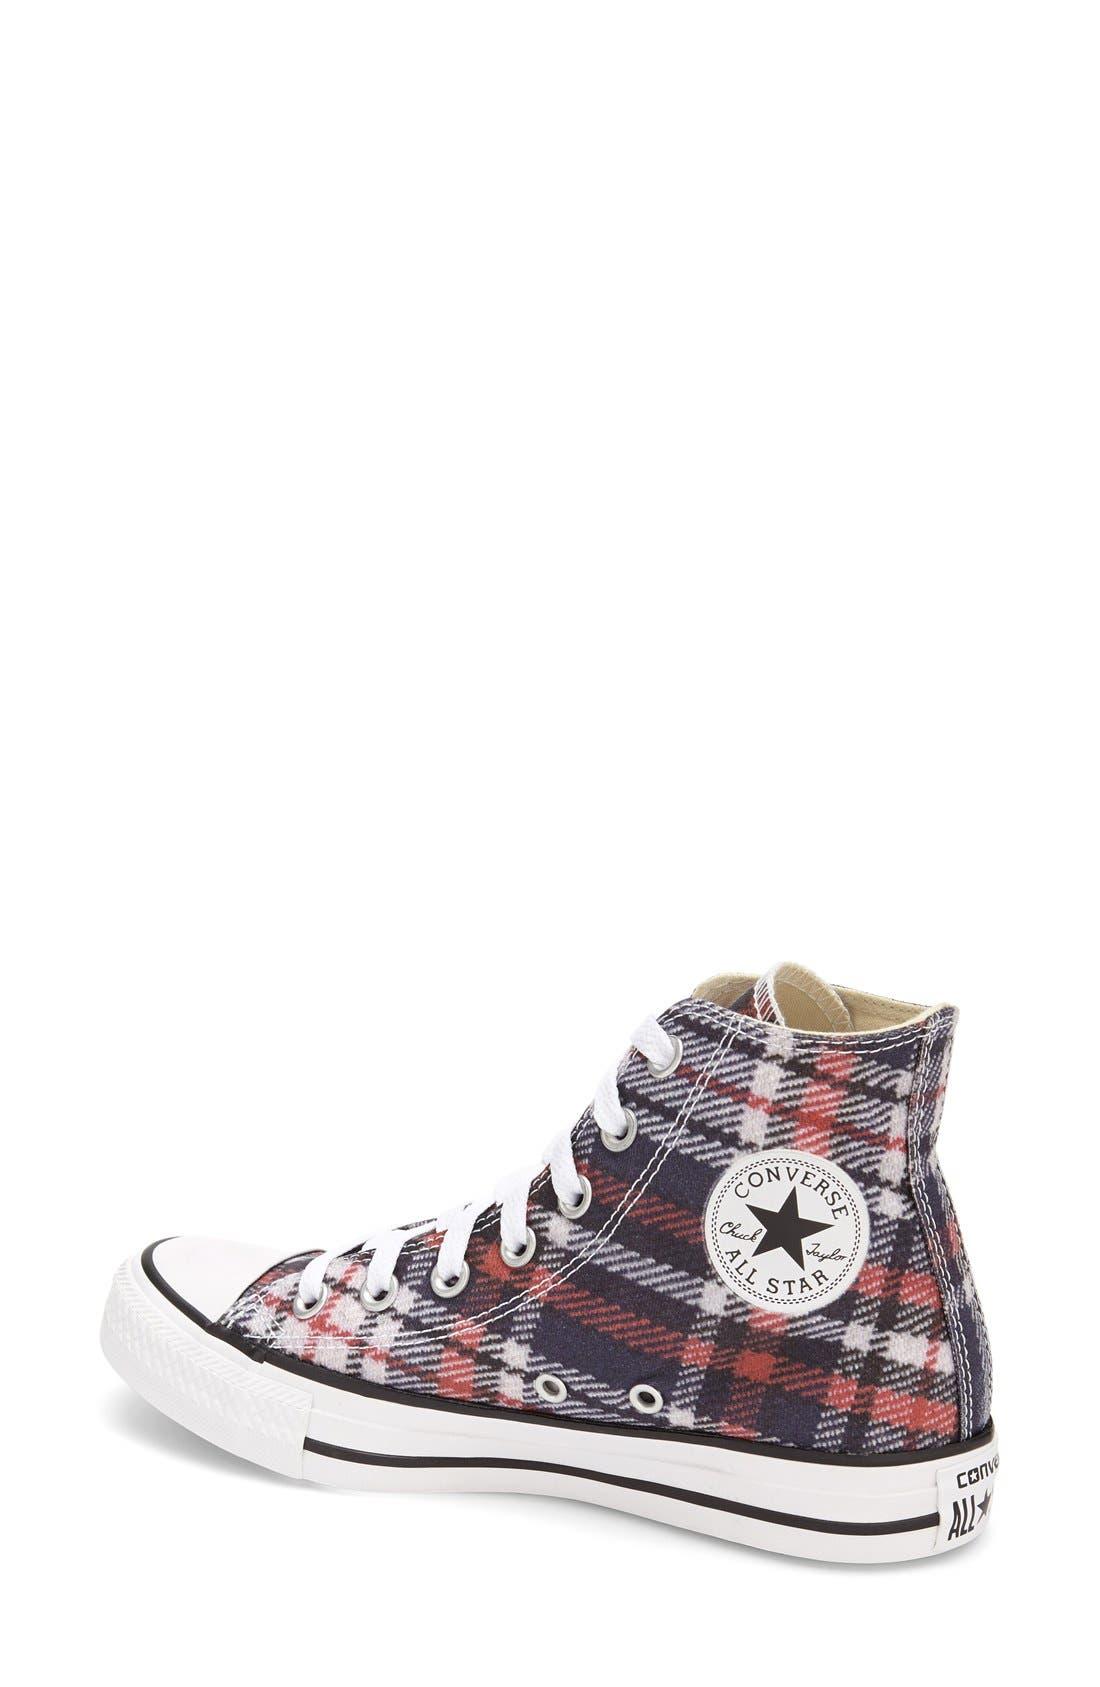 Alternate Image 2  - Converse Chuck Taylor® All Star® Plaid High Top Sneaker (Women)